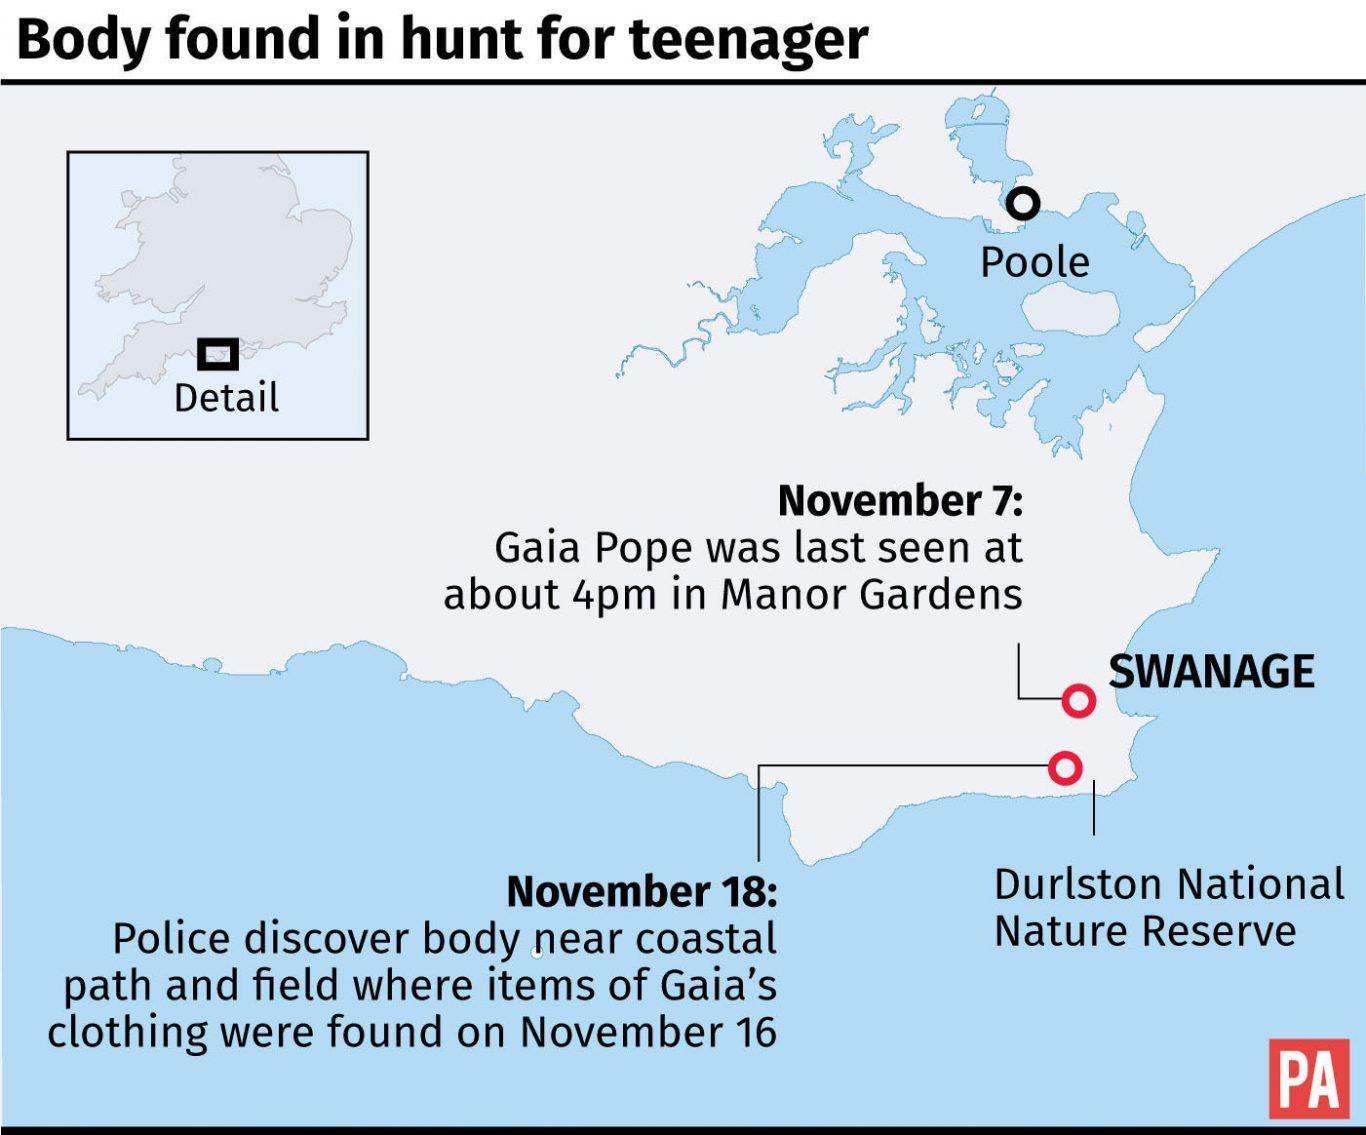 Map locates where body was found